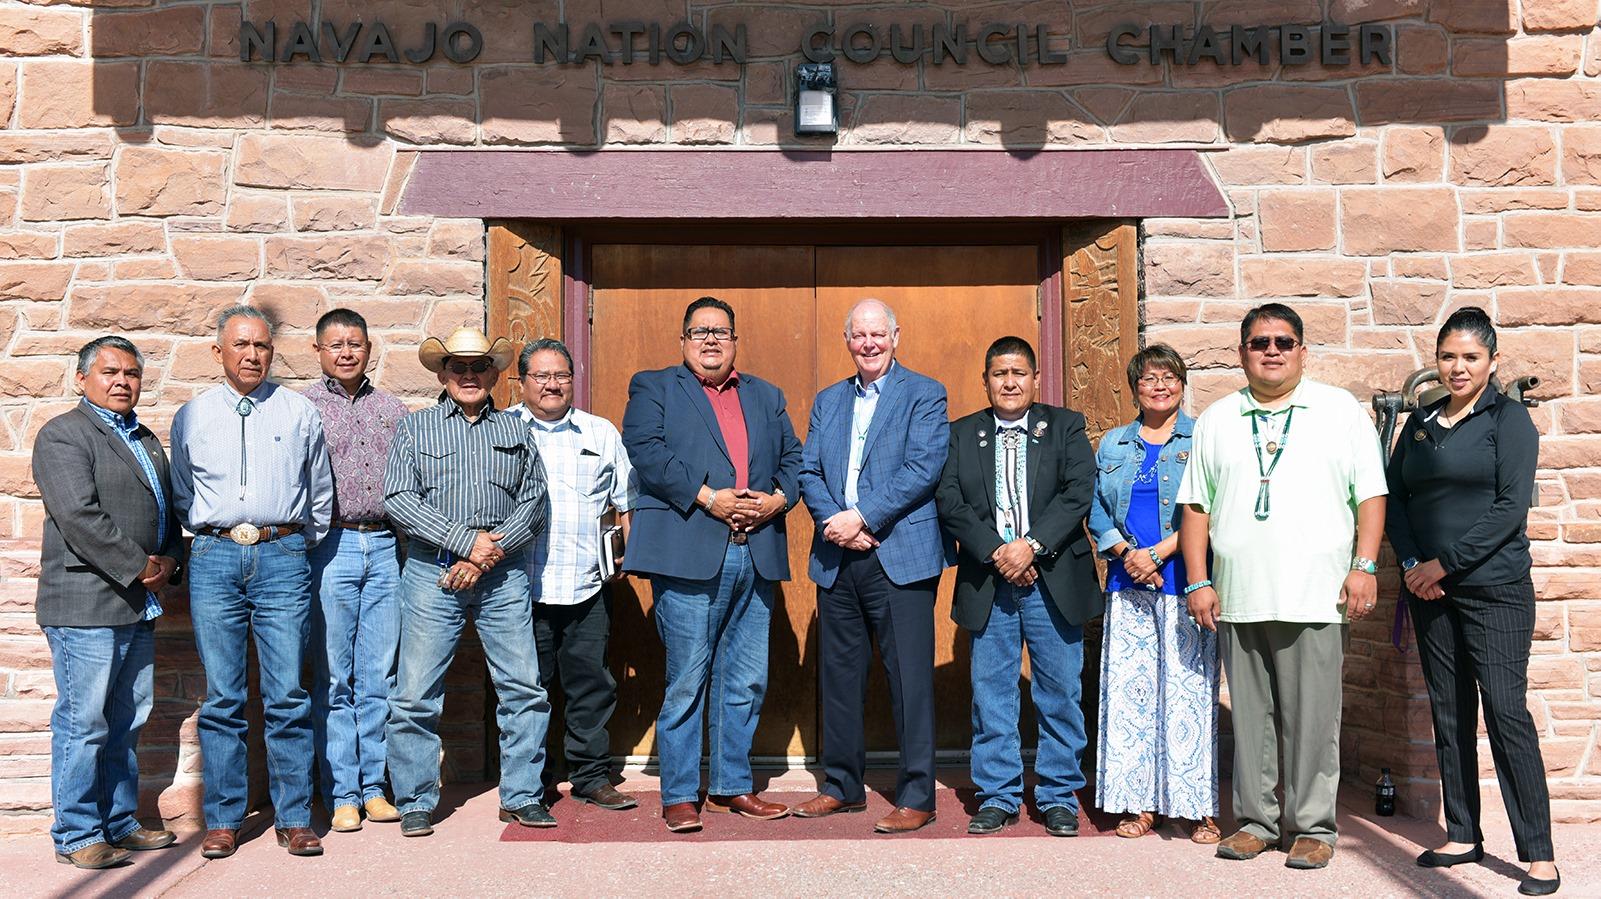 US Representative Tom O'Halleran Delivers Report from Congress to Navajo Nation Council Delegates